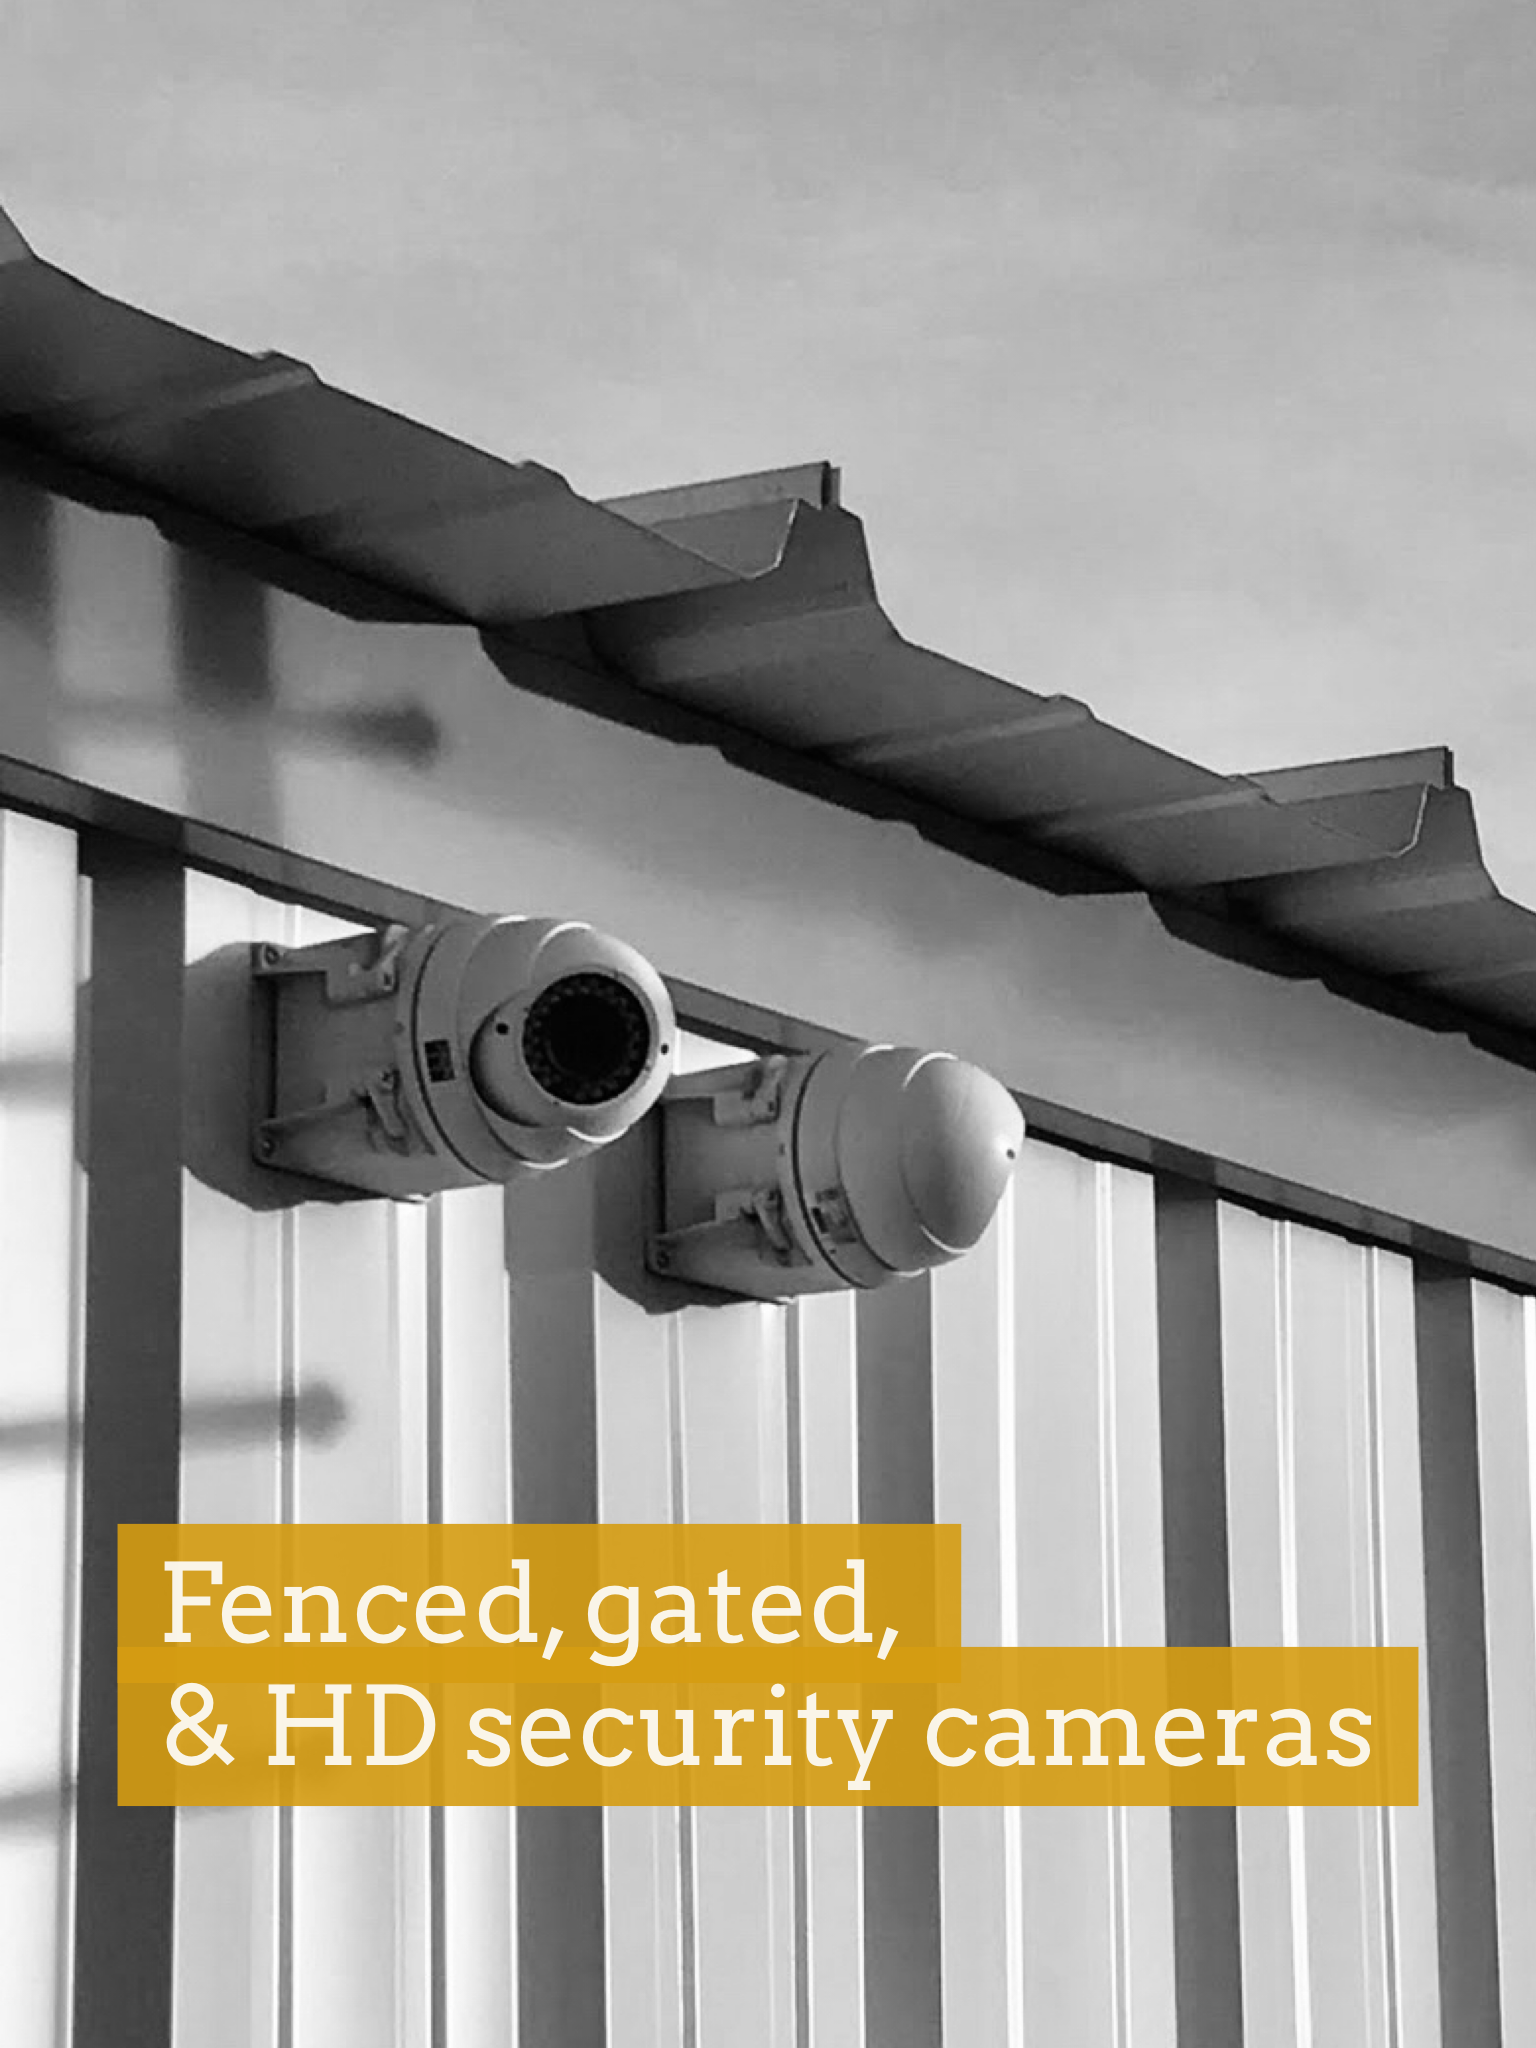 Prairie Self Storage - Cameras